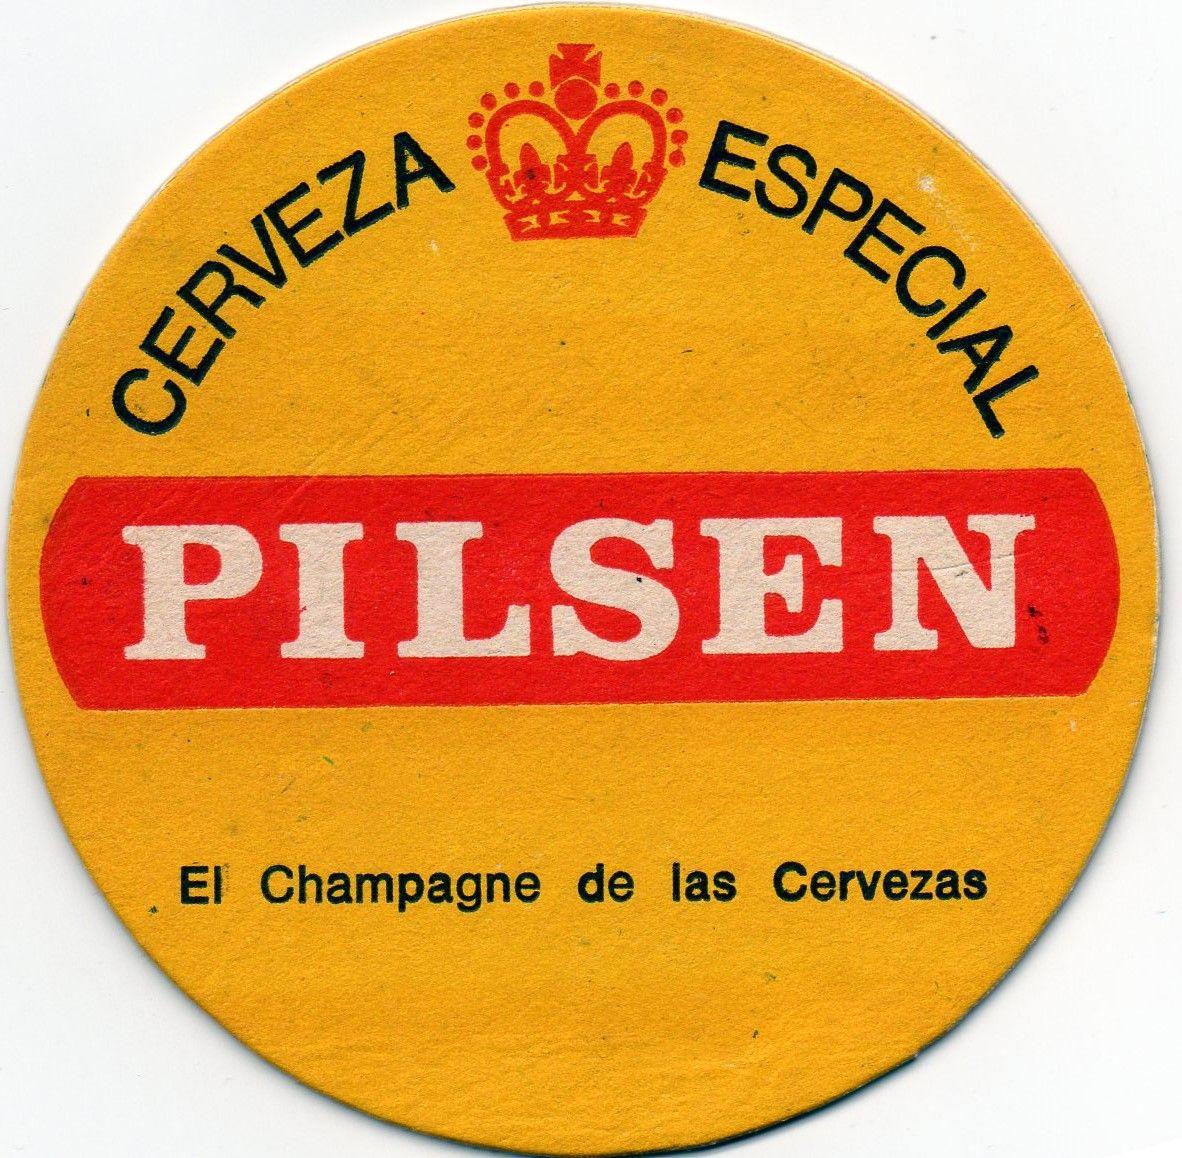 Pilsen El Champagne De Las Cervezas 70 80 Beer Coasters From  # Champagne Muebles Uy